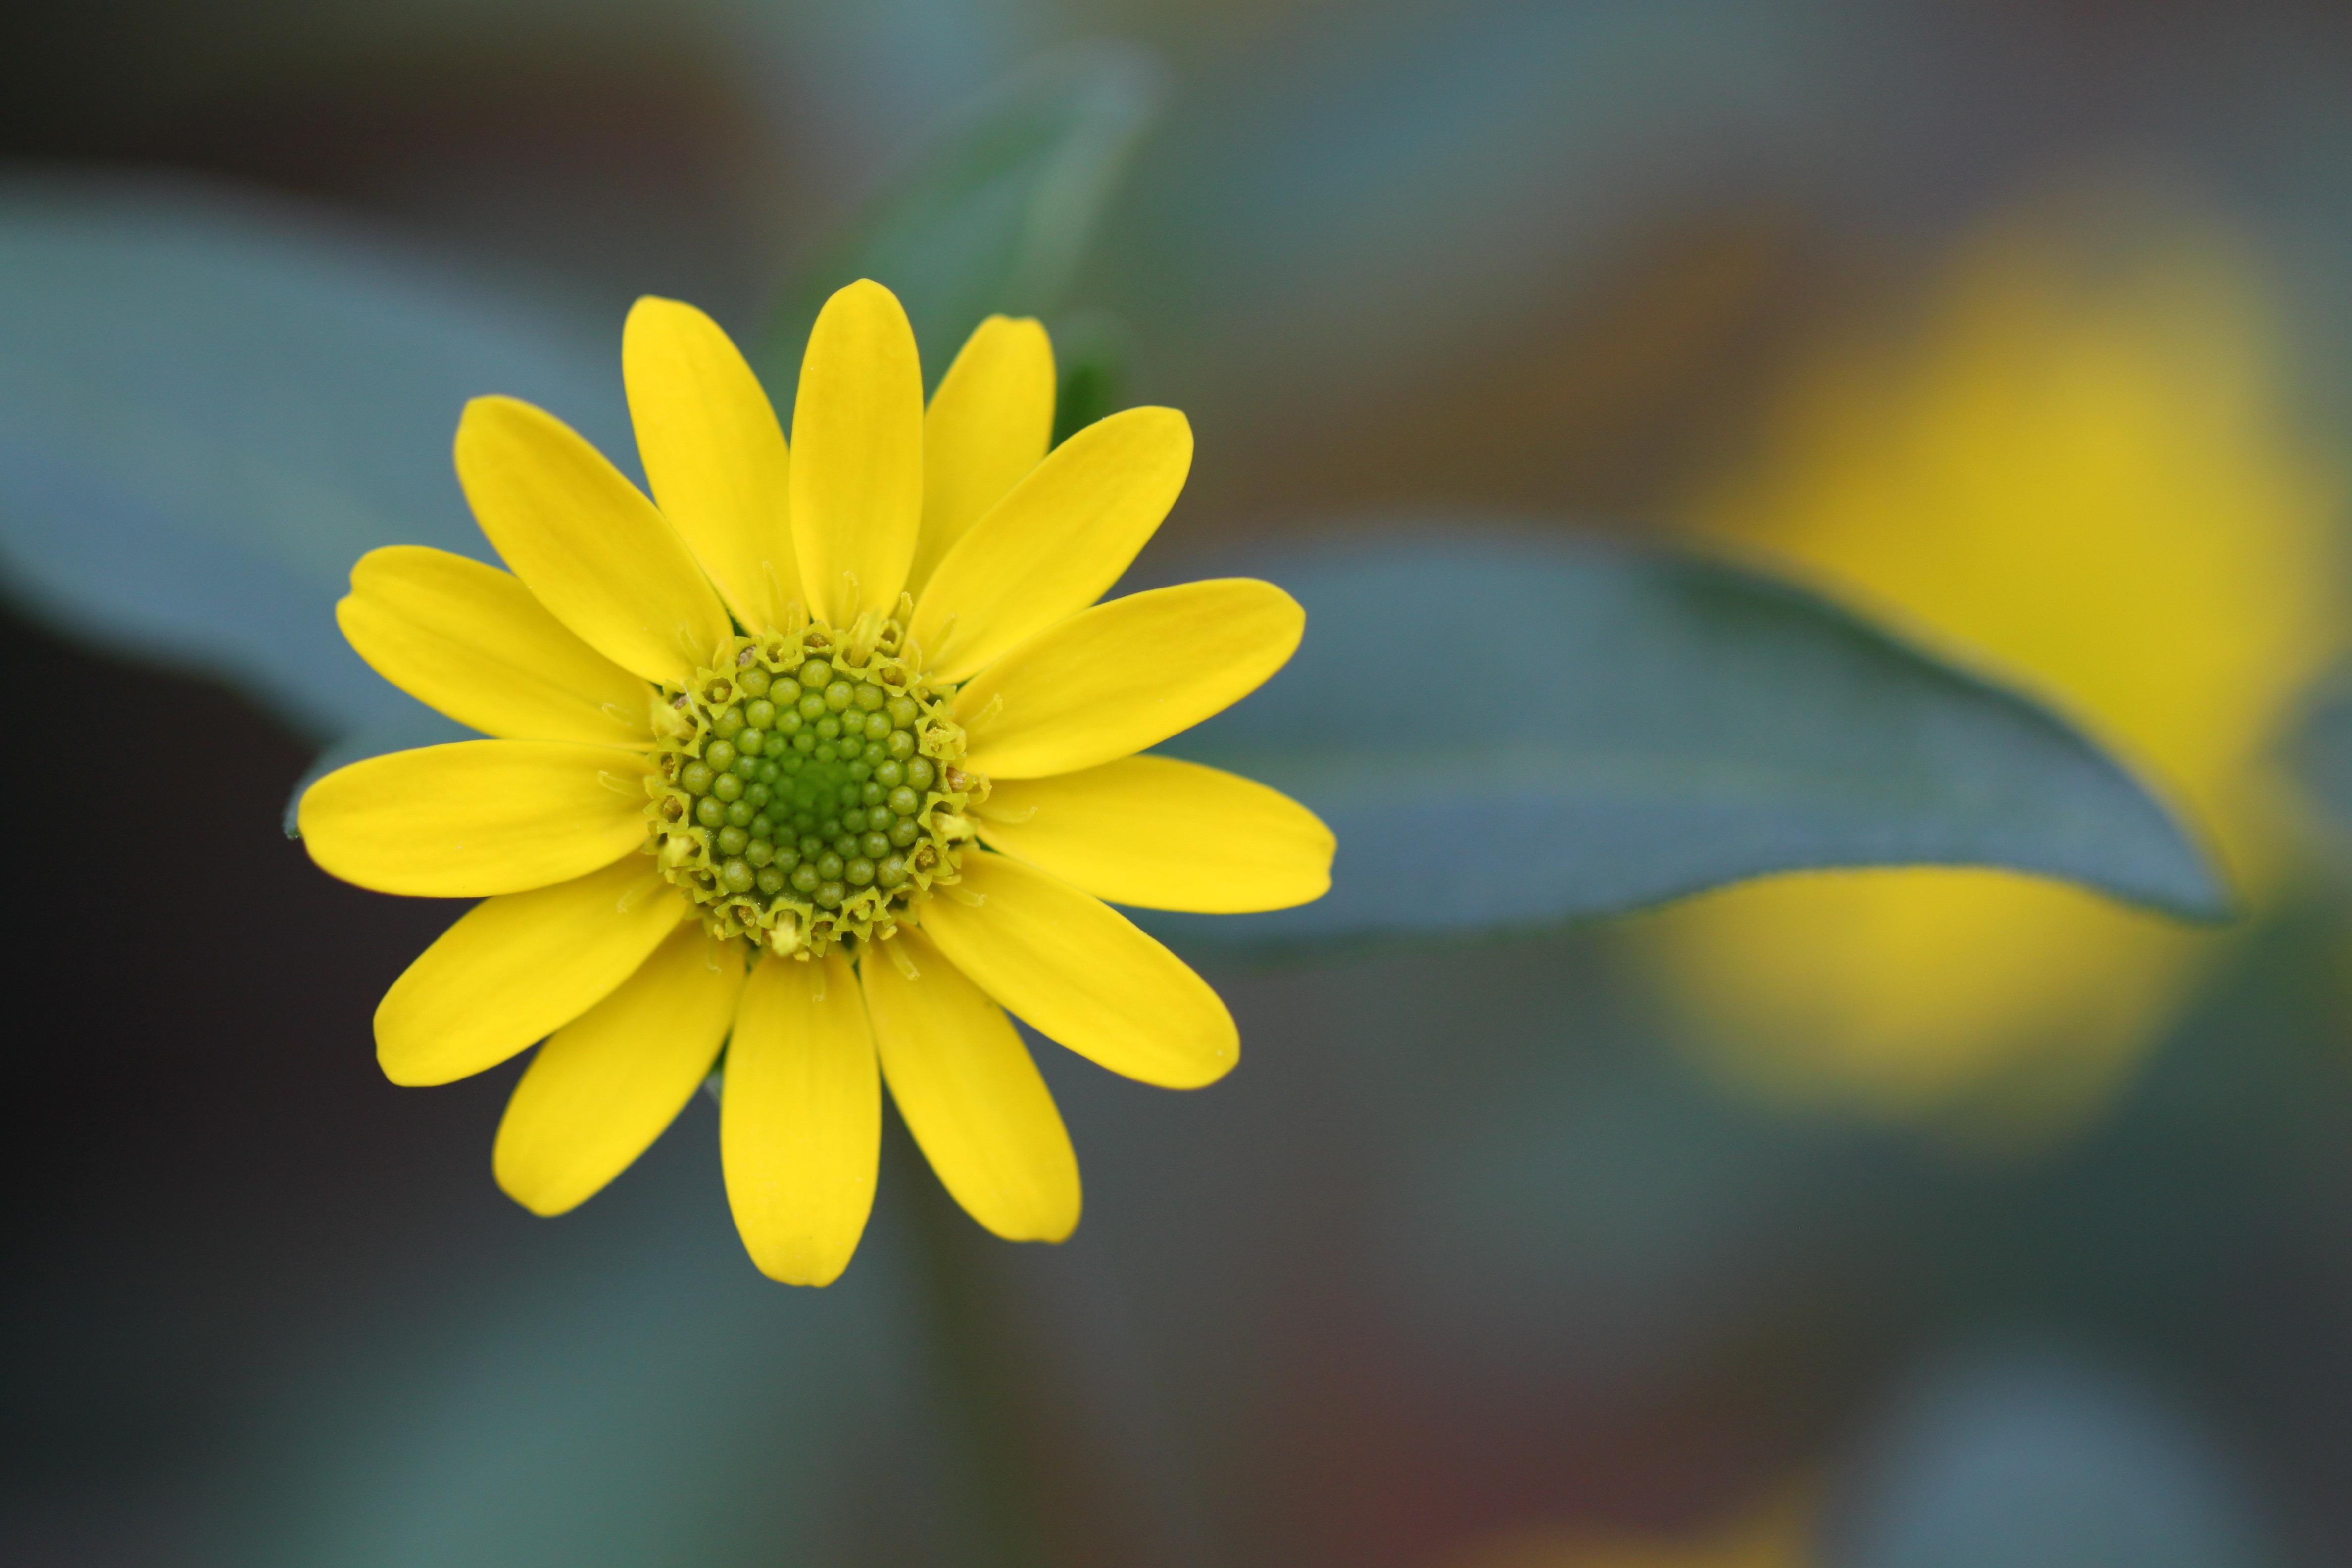 природа крупный план цветы желтые nature large plan flowers yellow без смс